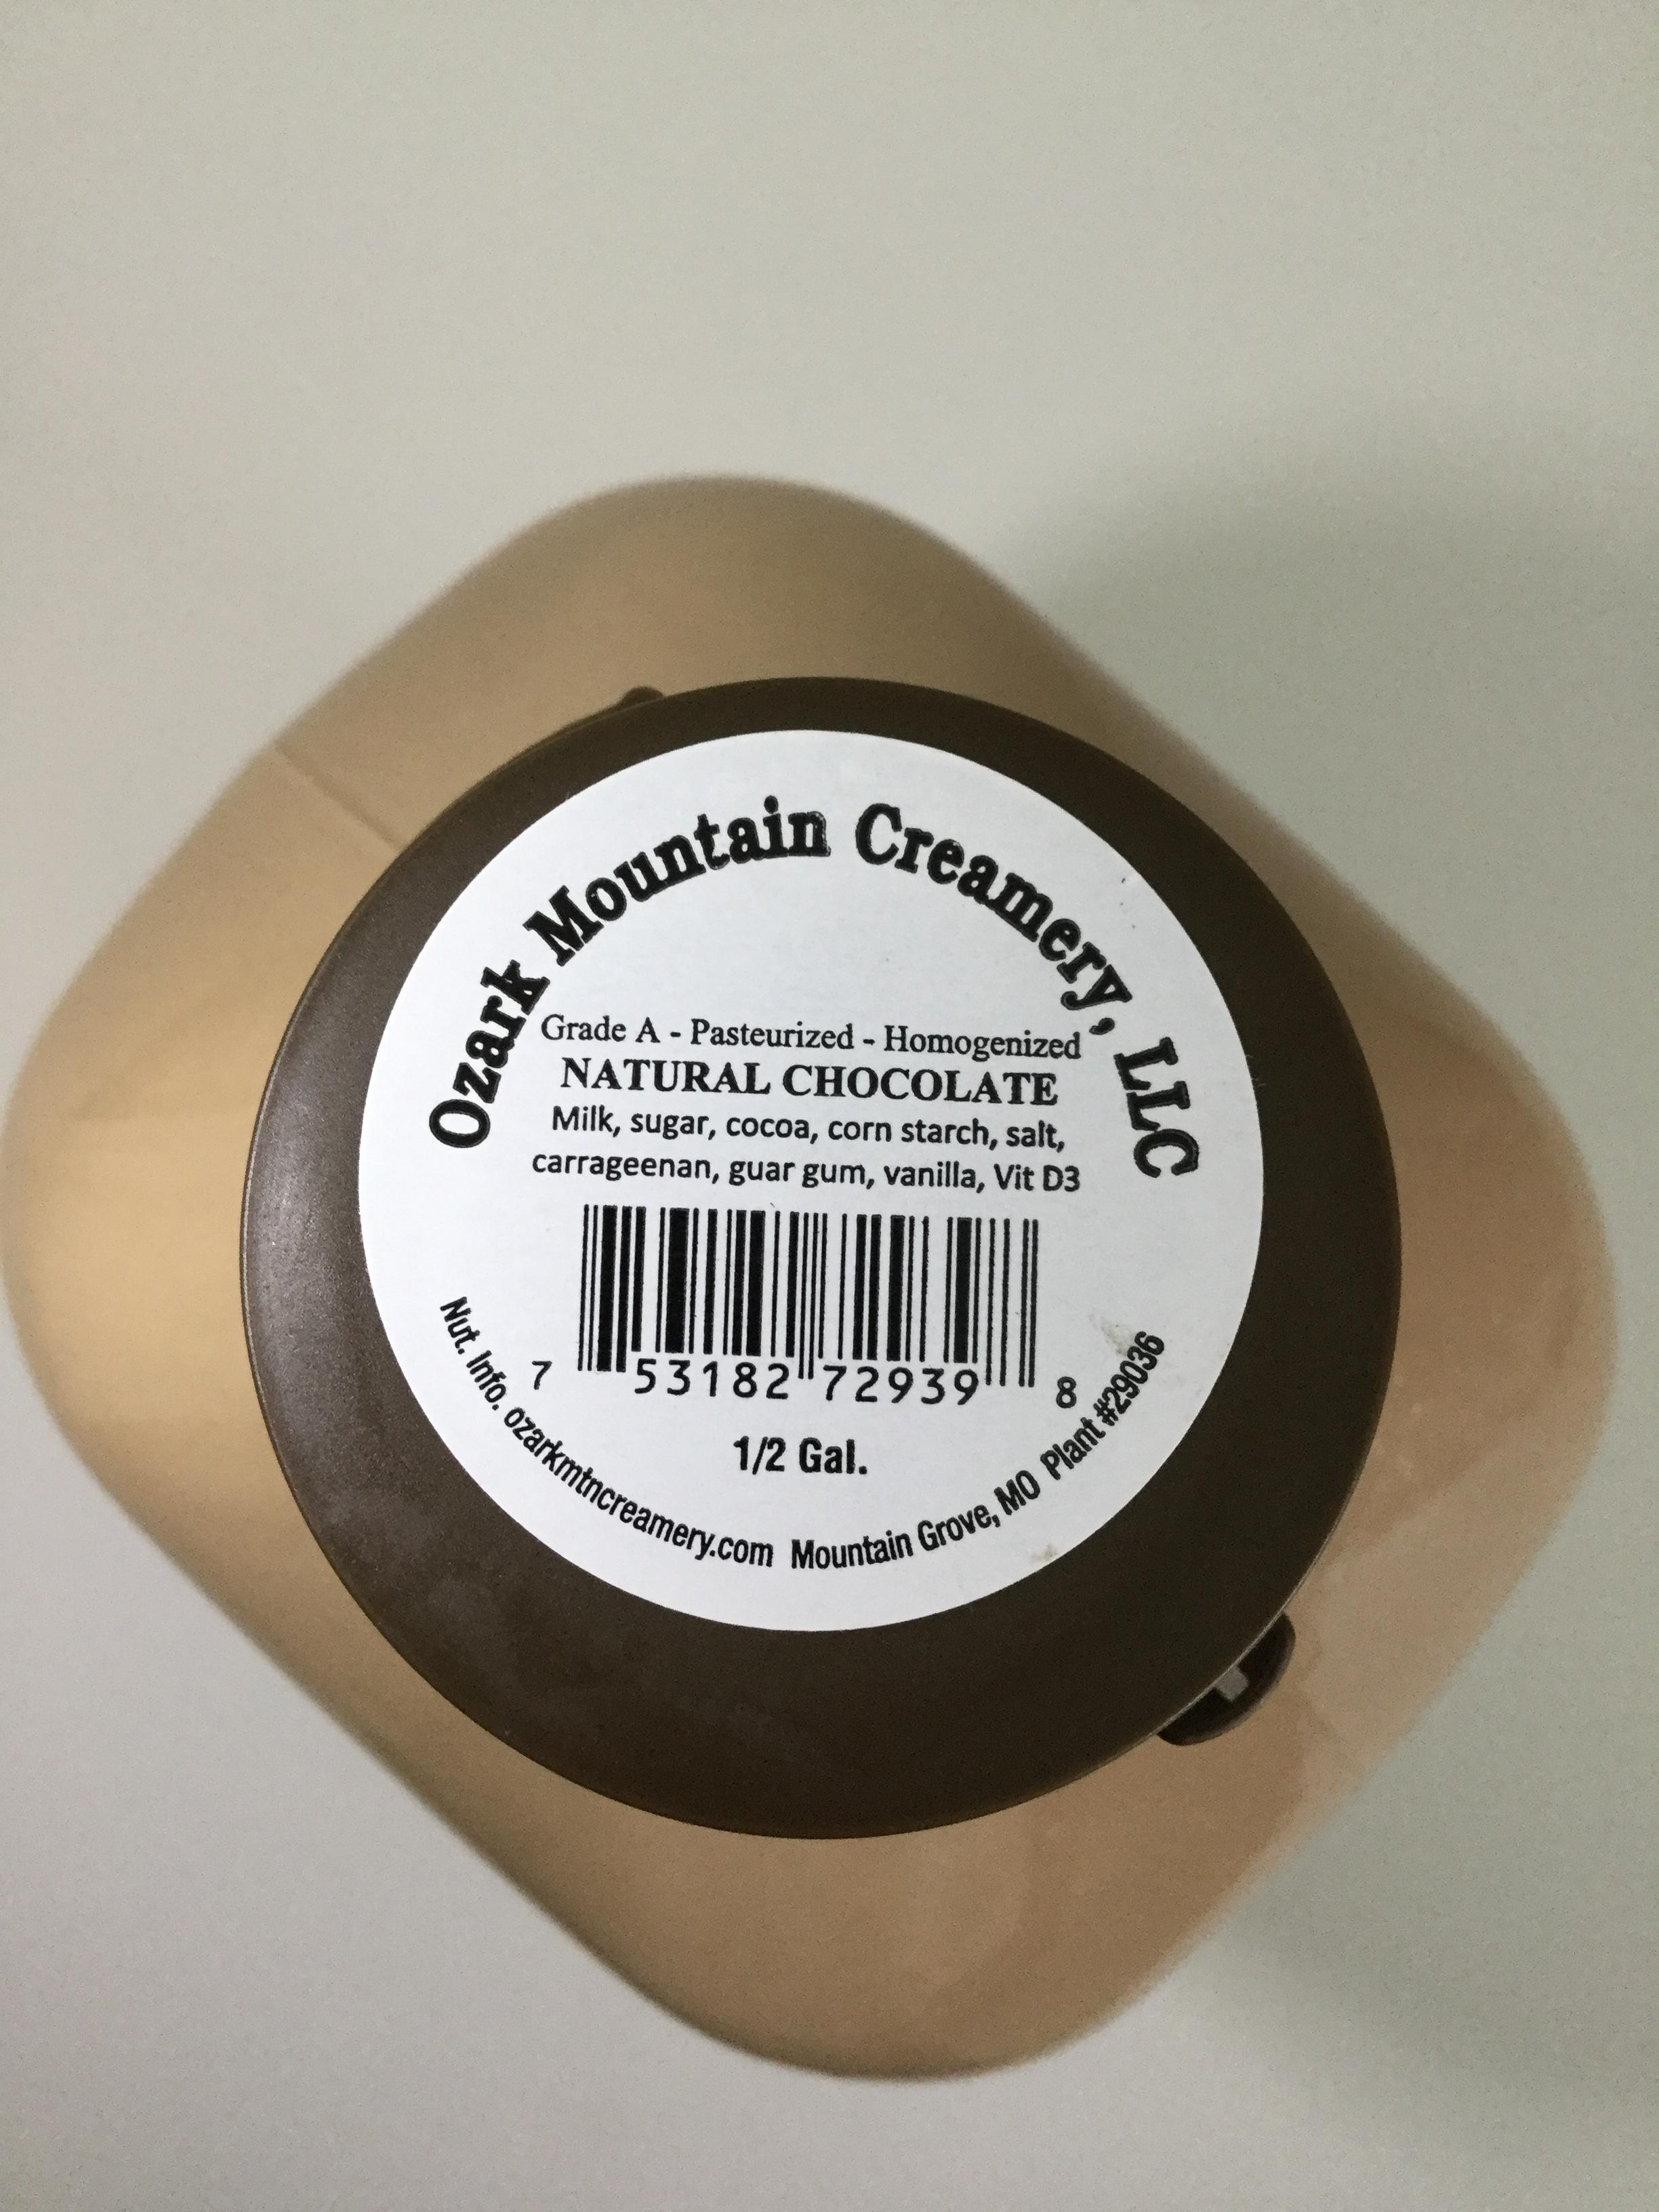 Ozark Mountain Creamery Chocolate Milk Top